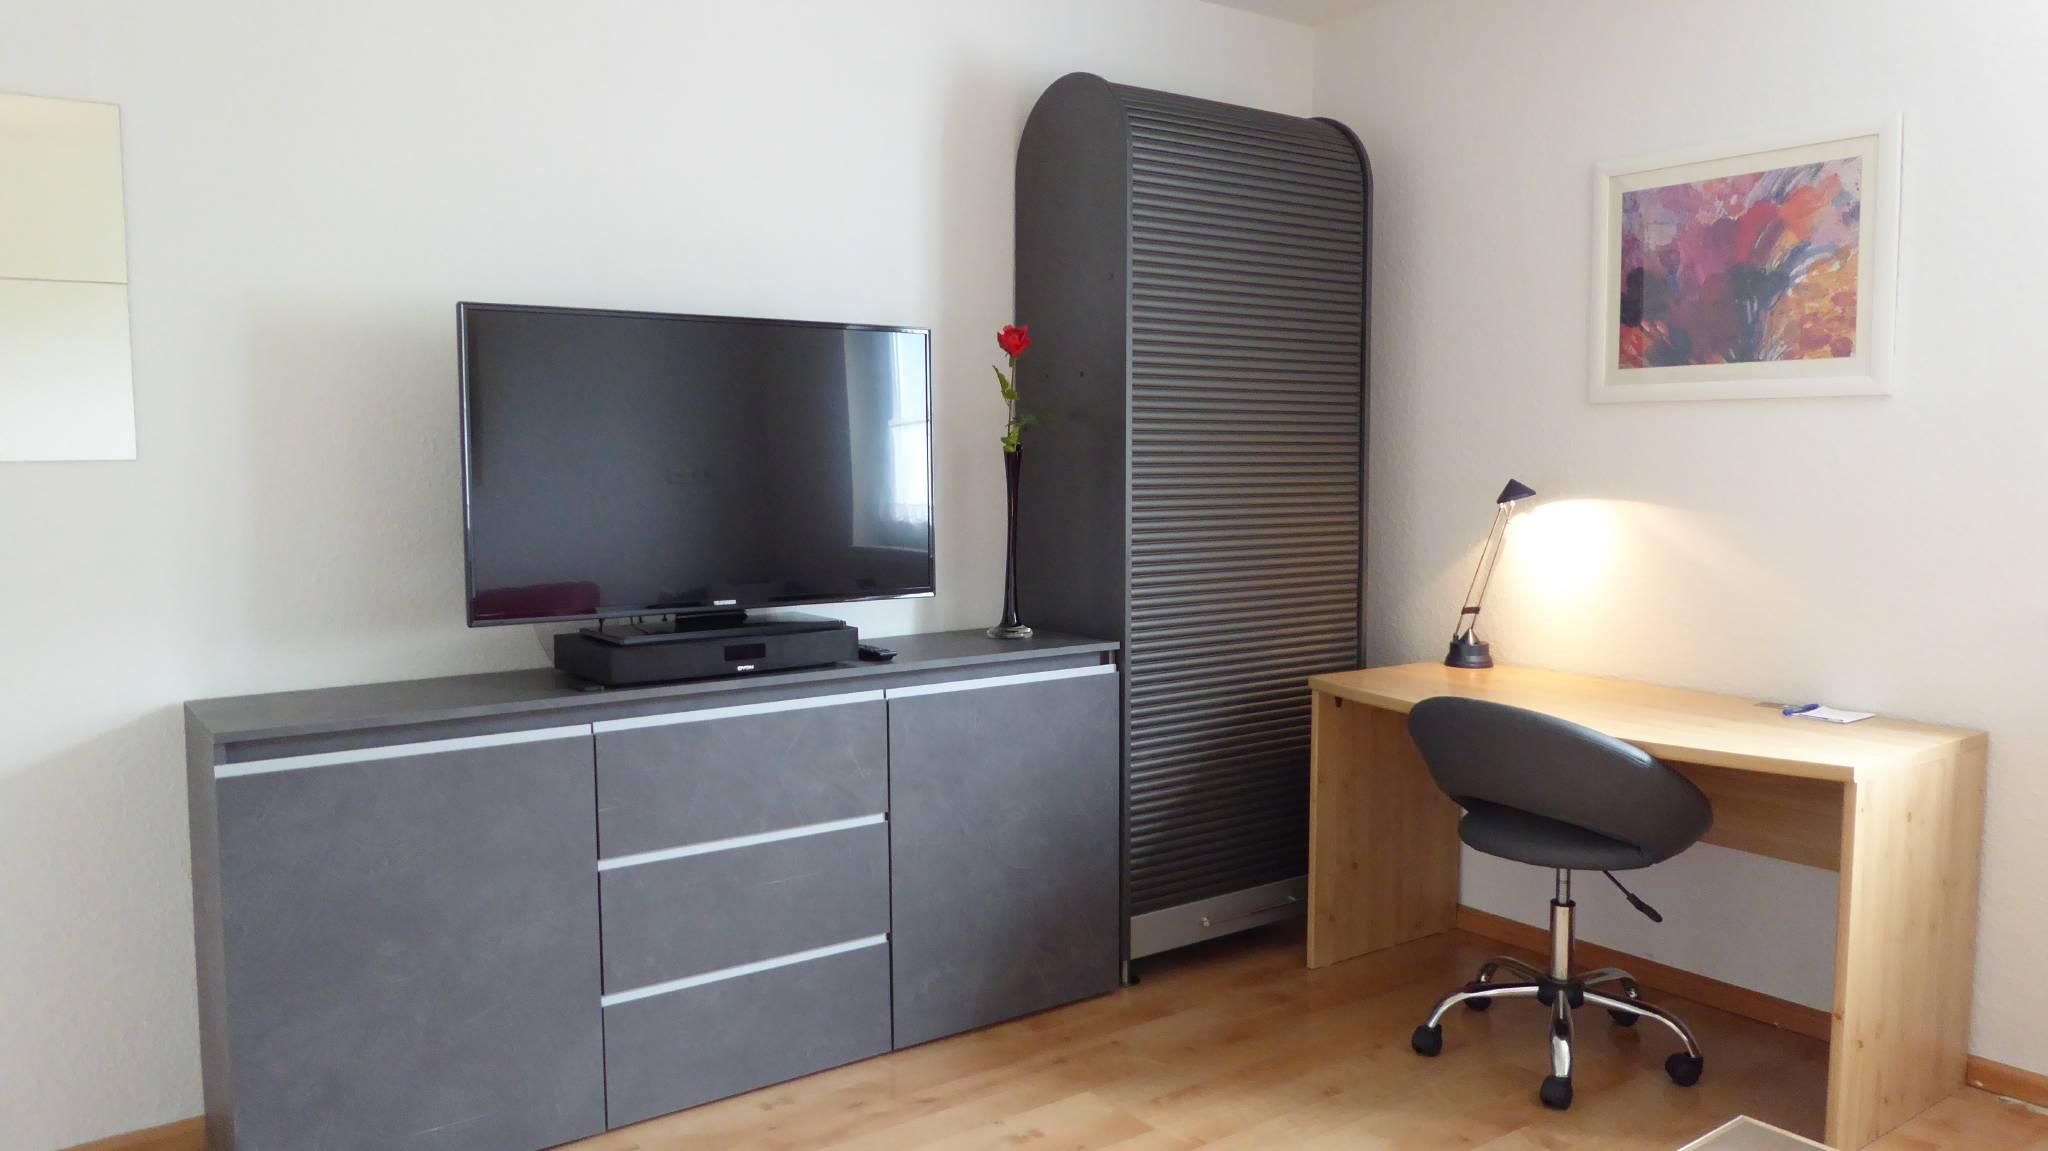 d4db64831e4 Apartment Krause in Lörrach Baden-Württemberg